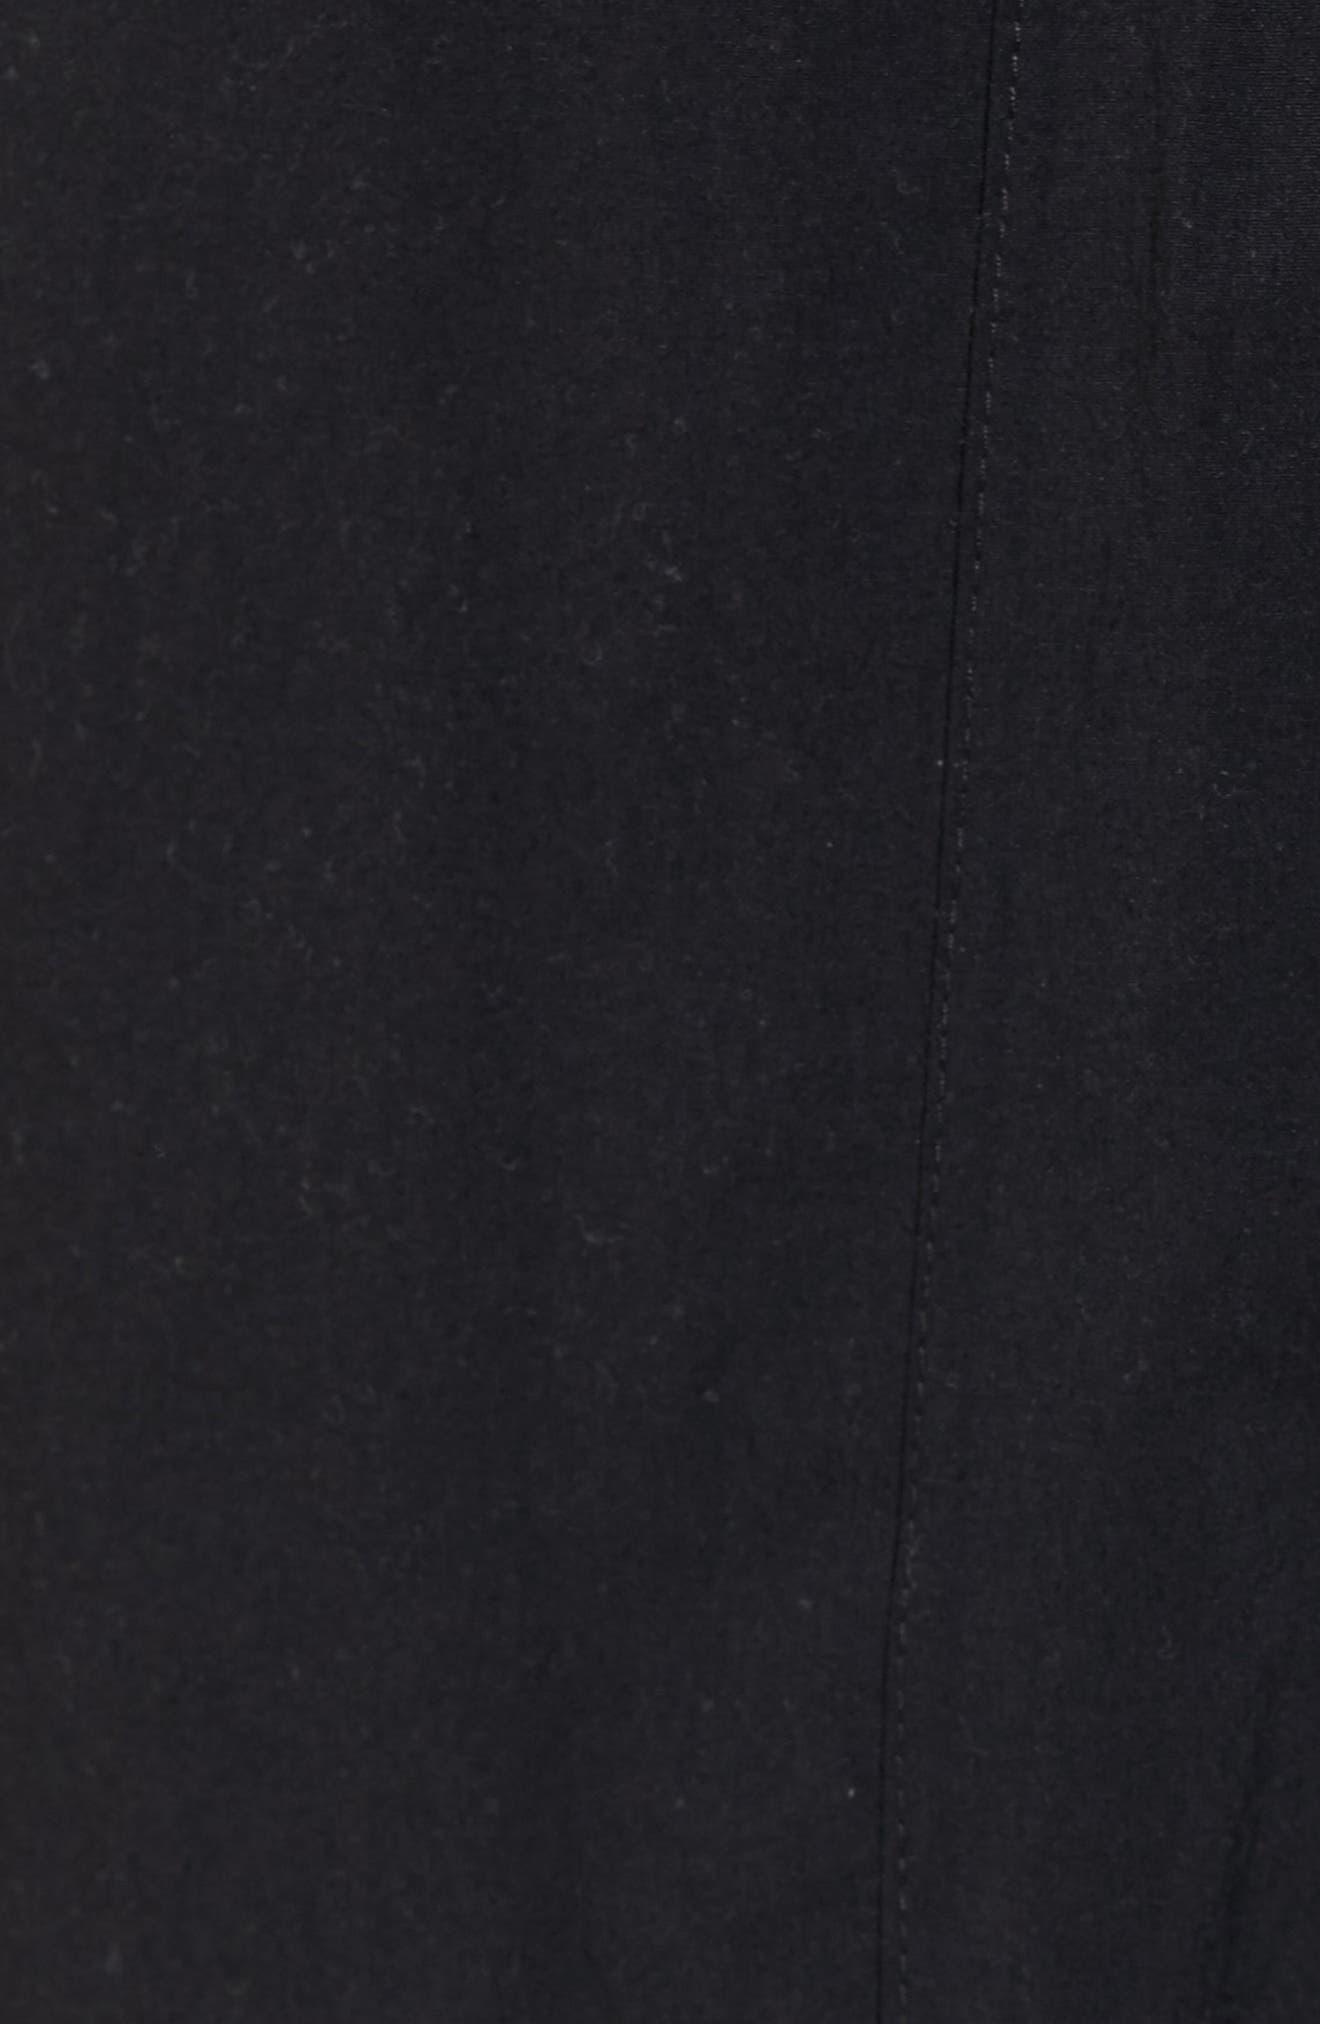 N279 Sweatpants,                             Alternate thumbnail 5, color,                             Black